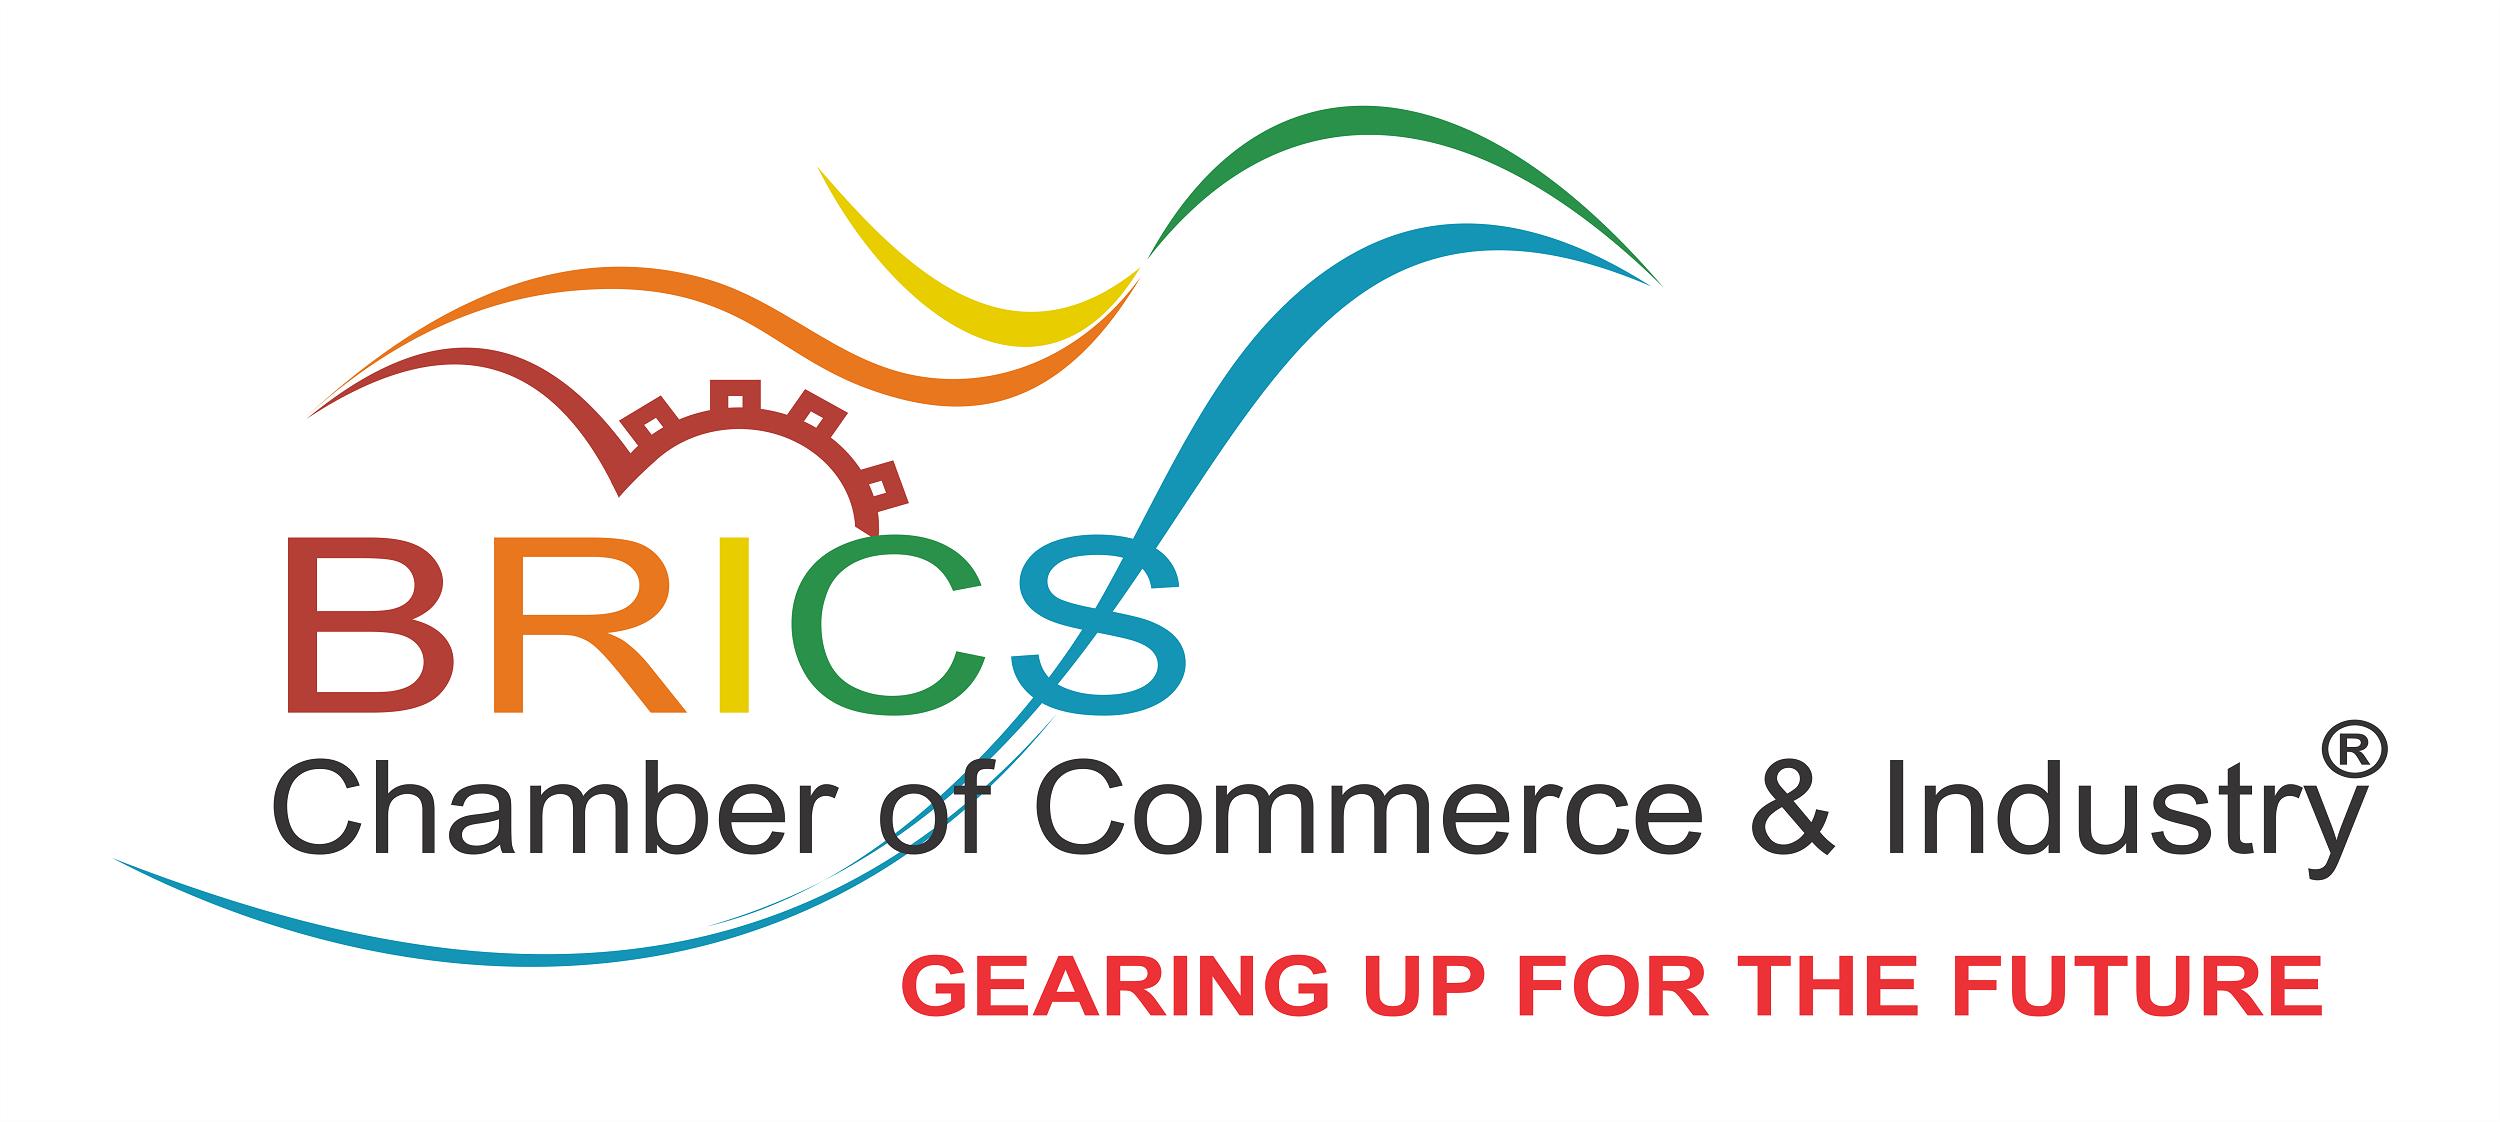 BRICS CCI Logo